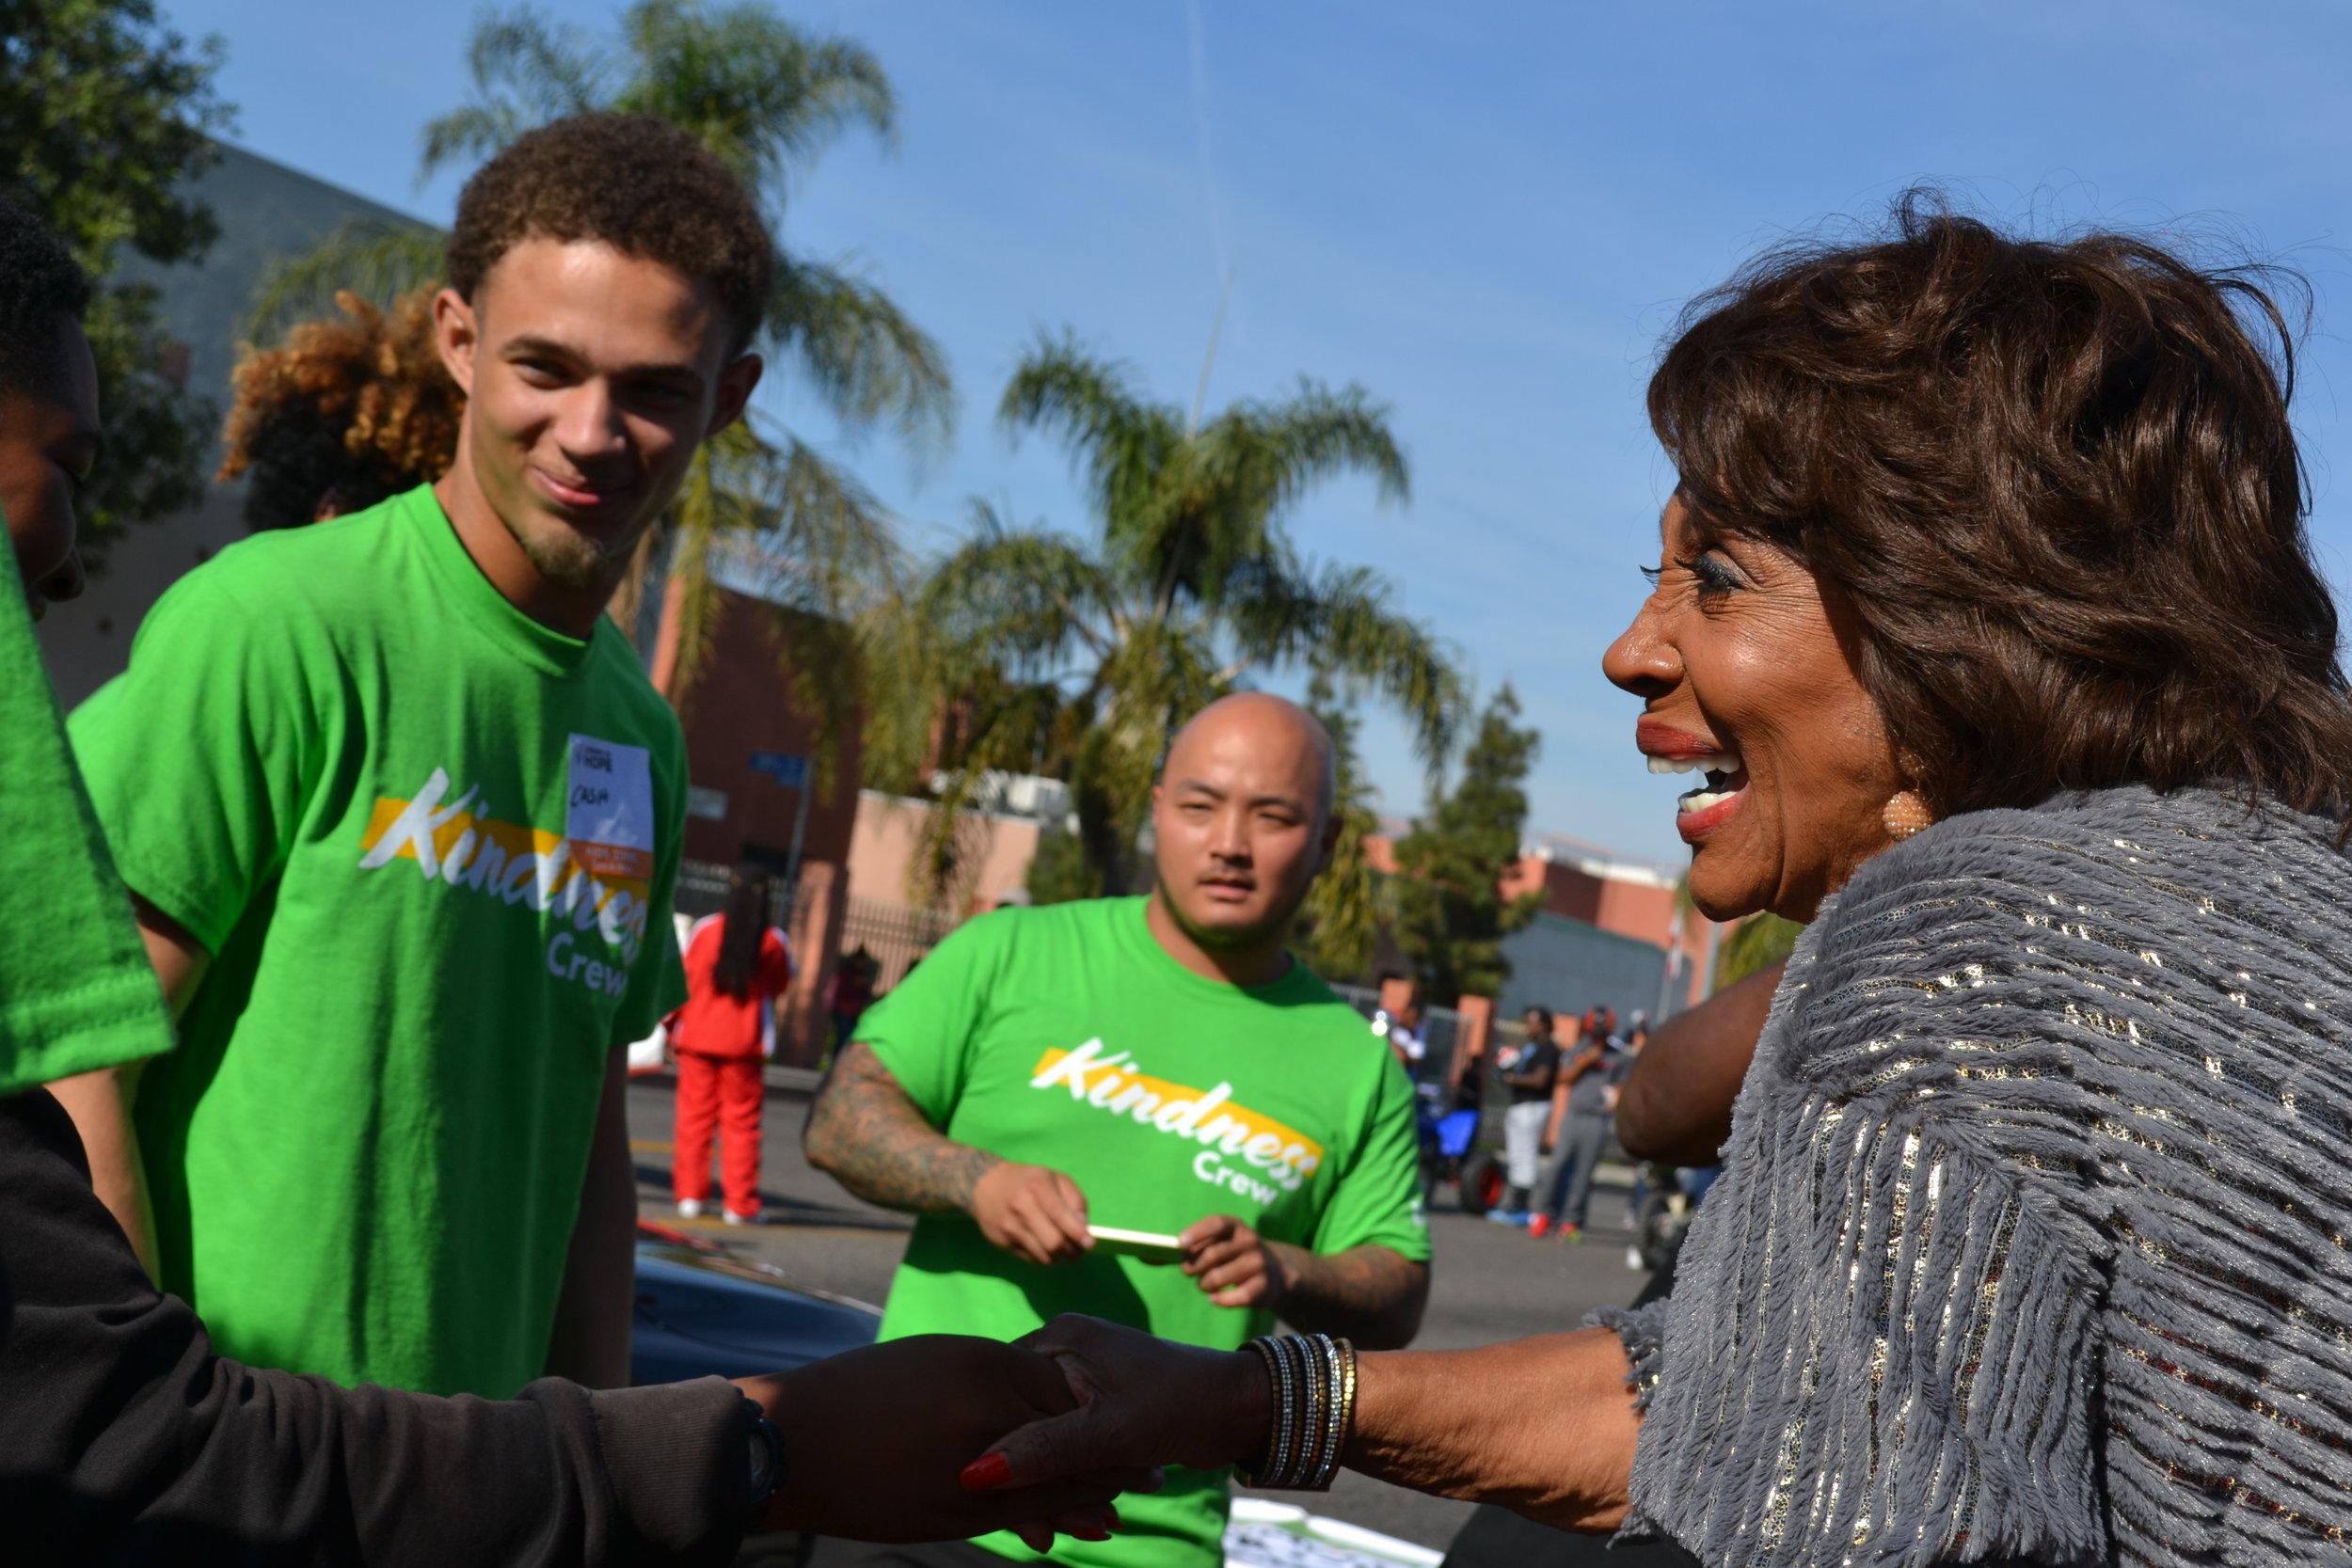 Congresswoman Waters is introduced to area volunteers.